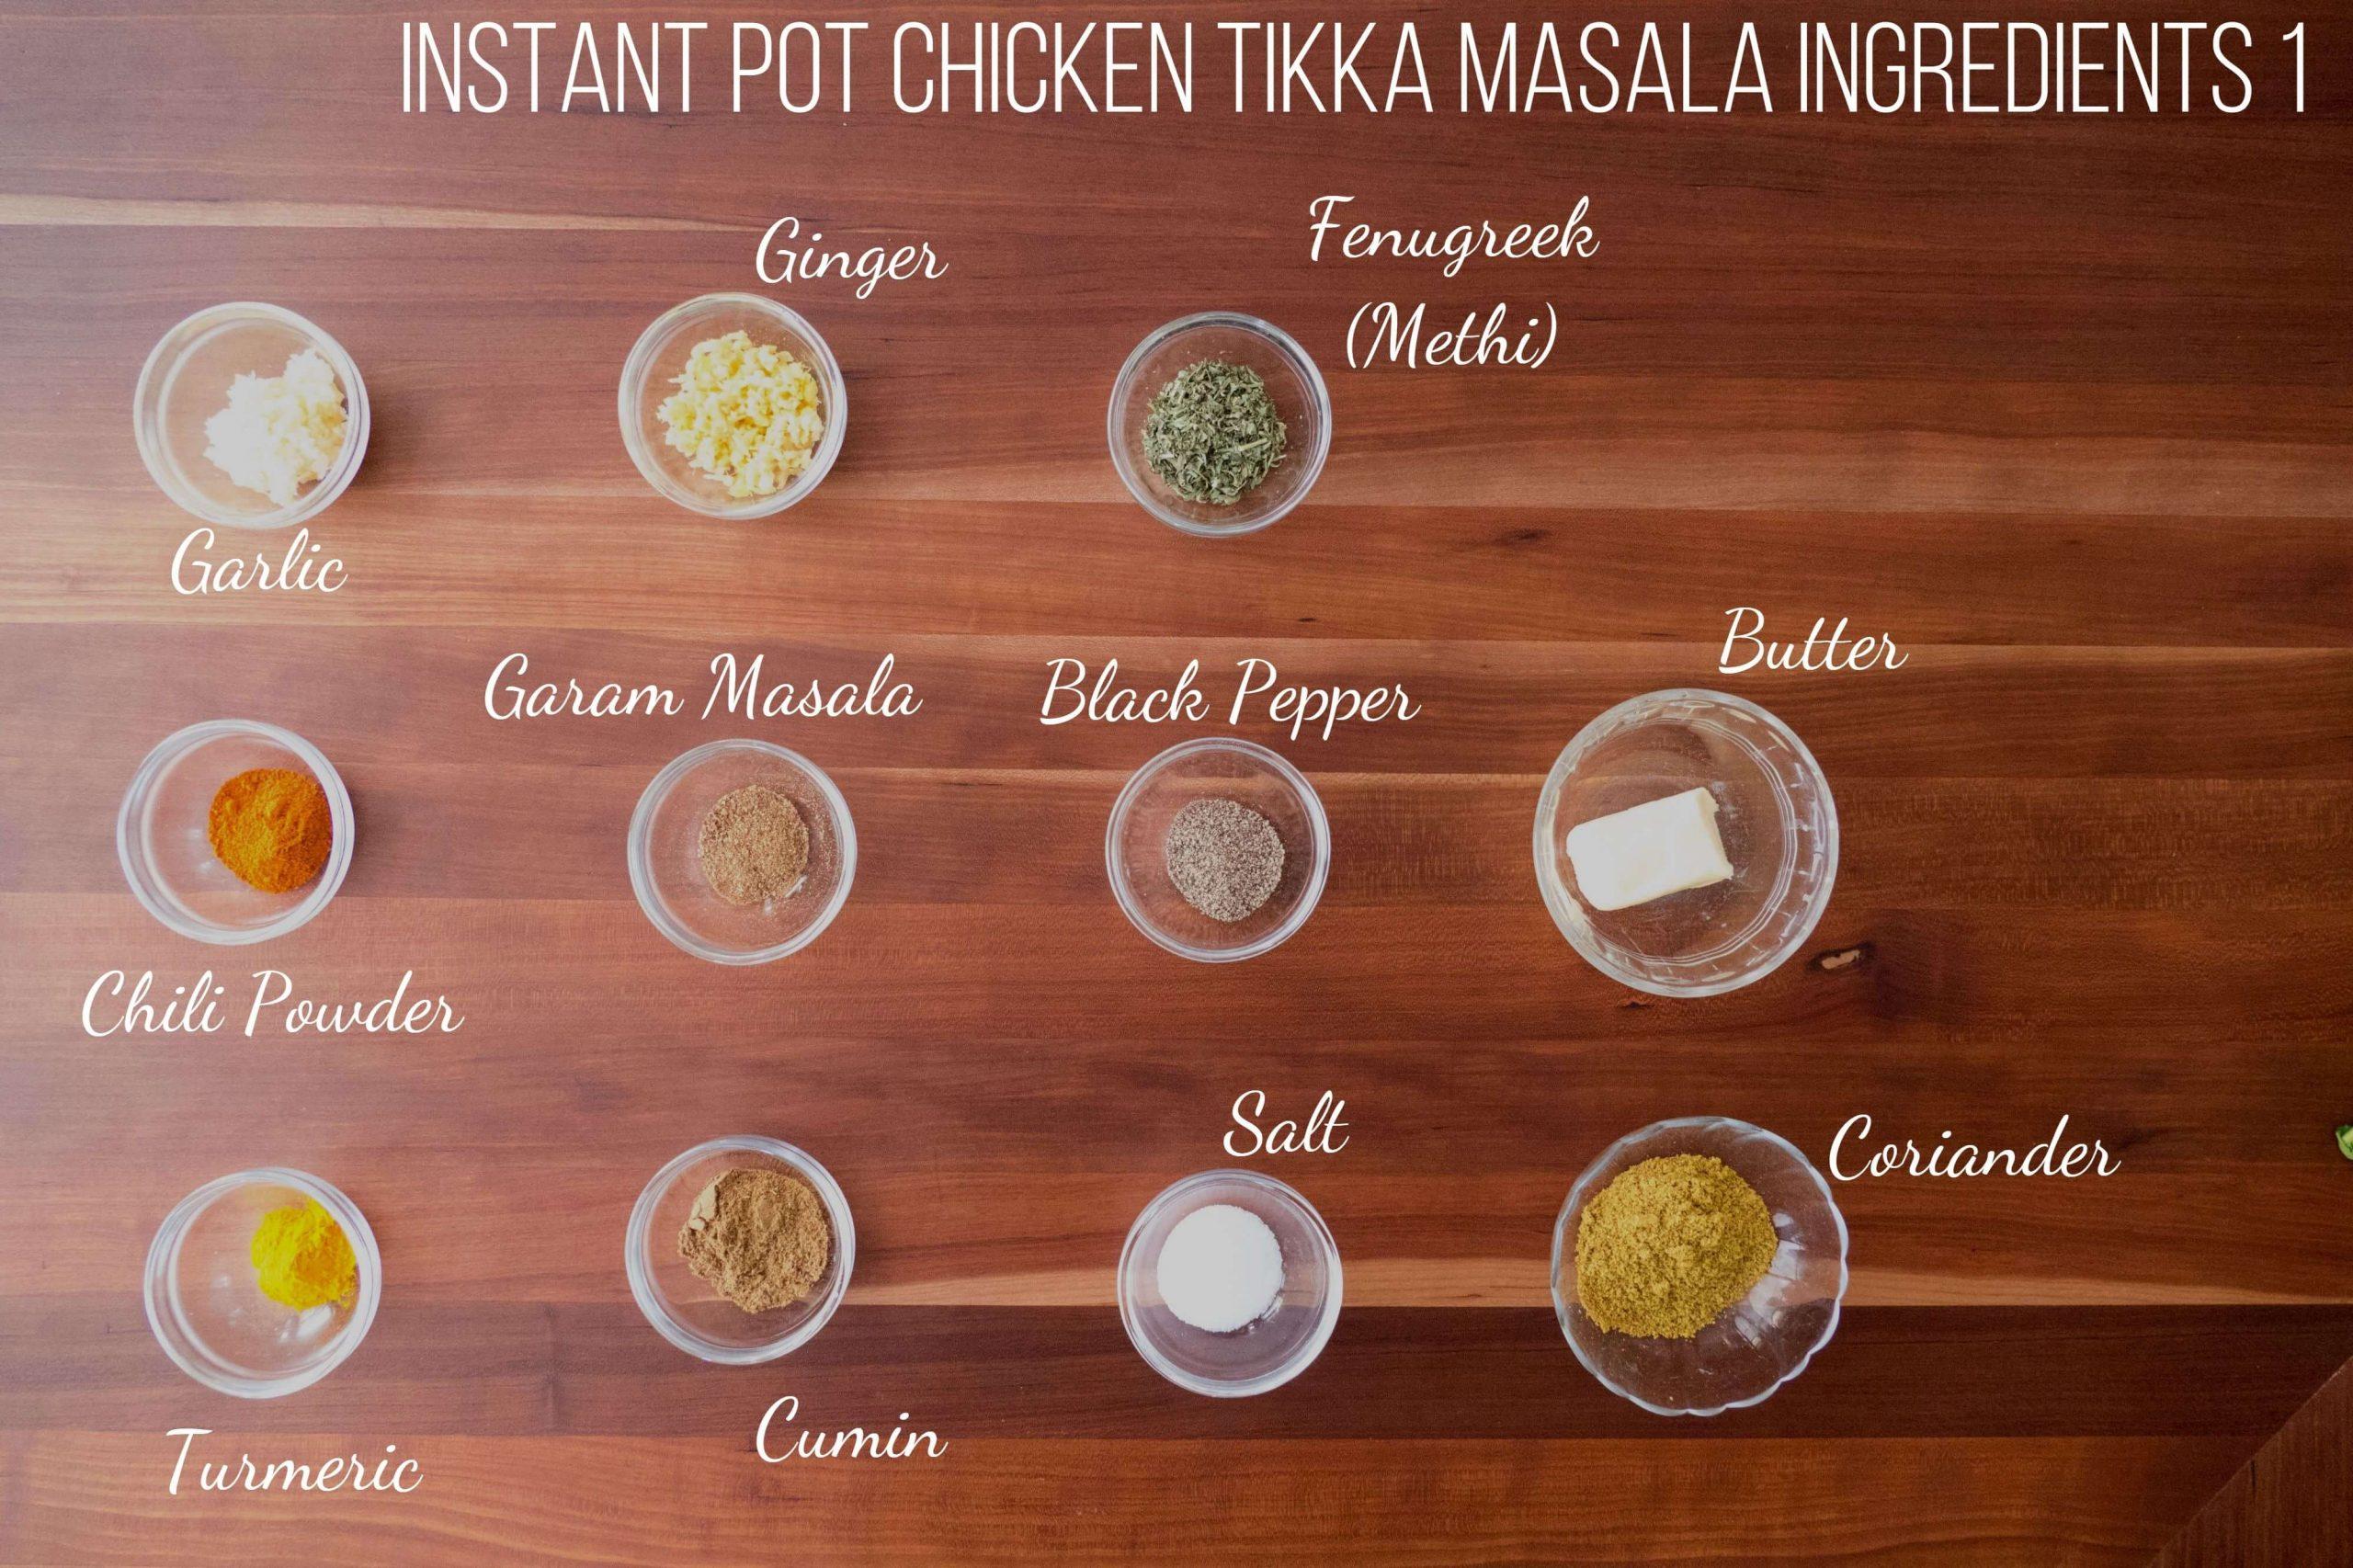 Instant Pot Chicken Tikka Masala Ingredients 1 - garlic, ginger, fenugreek (methi) chili powder, garam masala, black pepper, butter, turmeric, cumin, salt, coriander - Paint the Kitchen Red